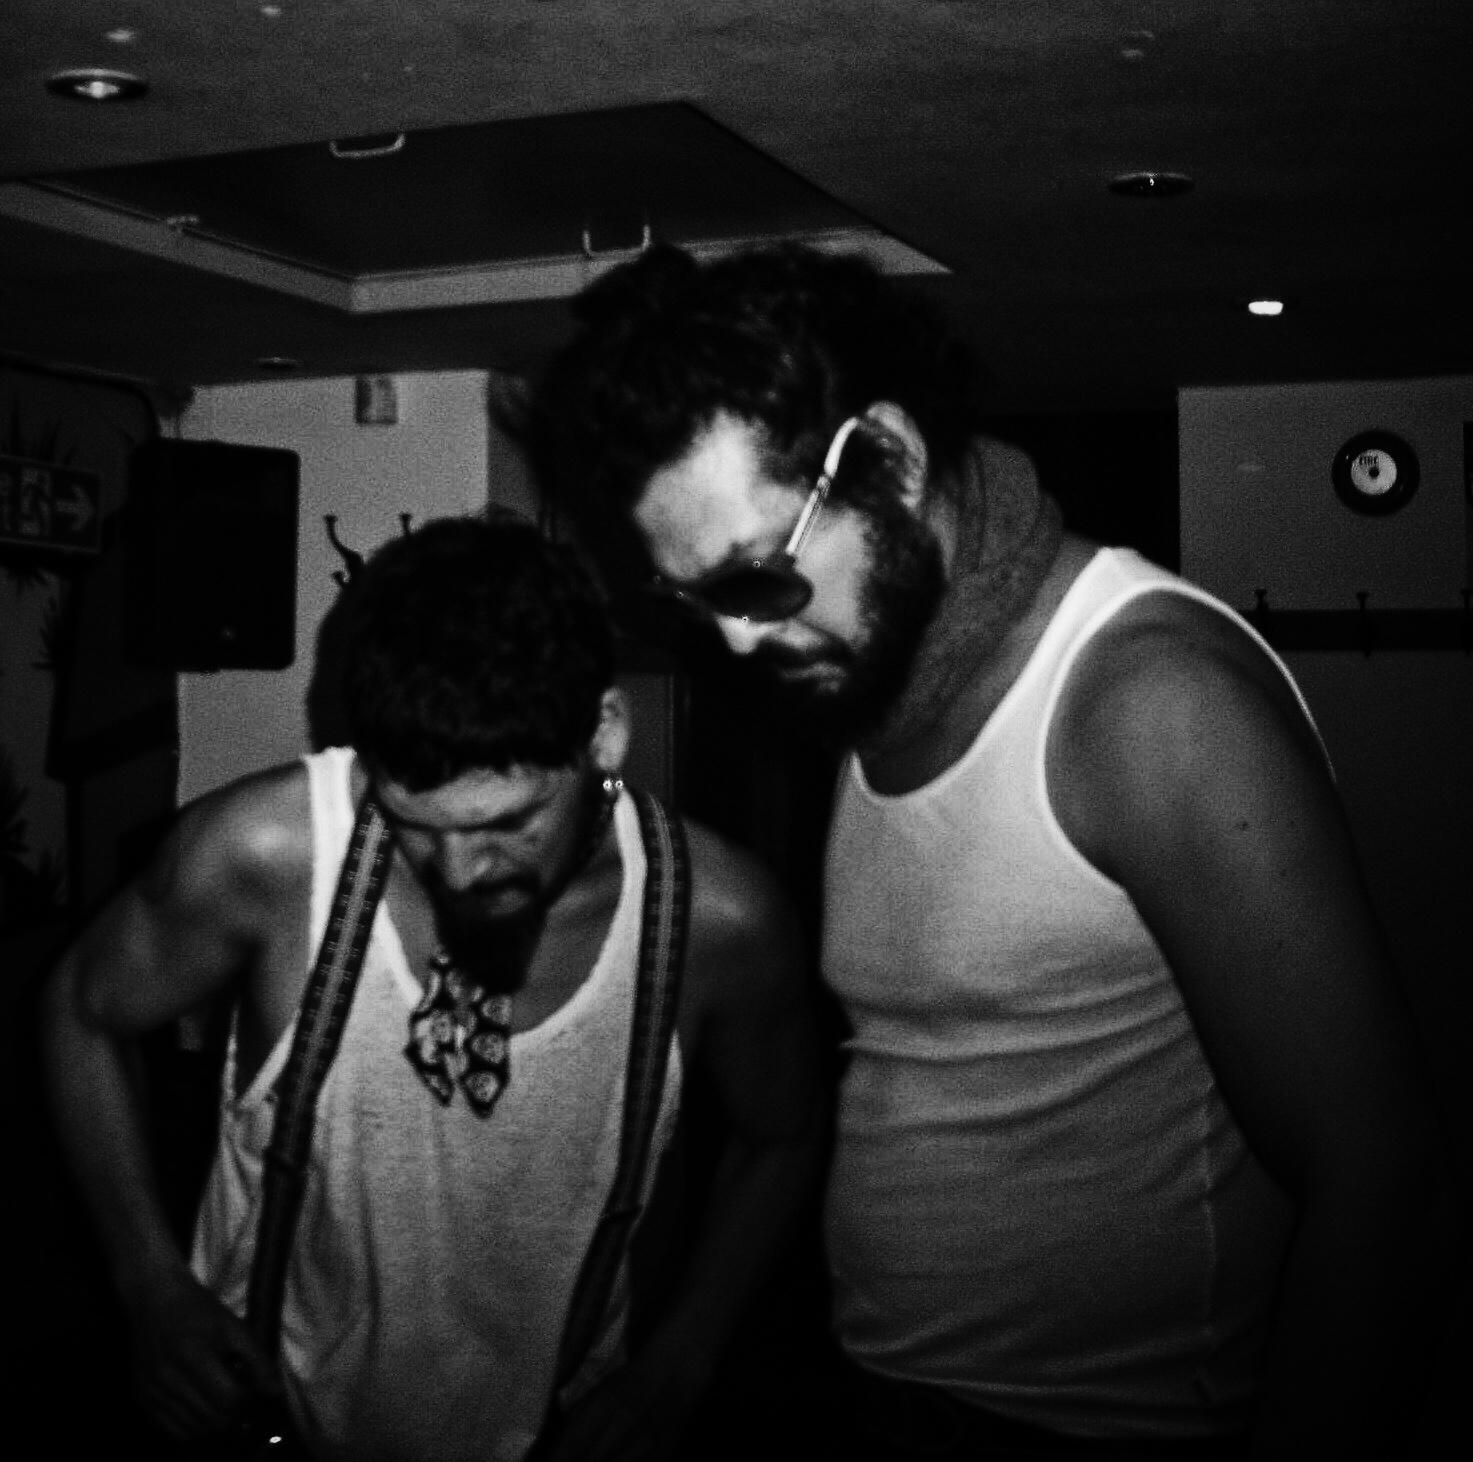 Santo's Salsa et Funk at Laylow